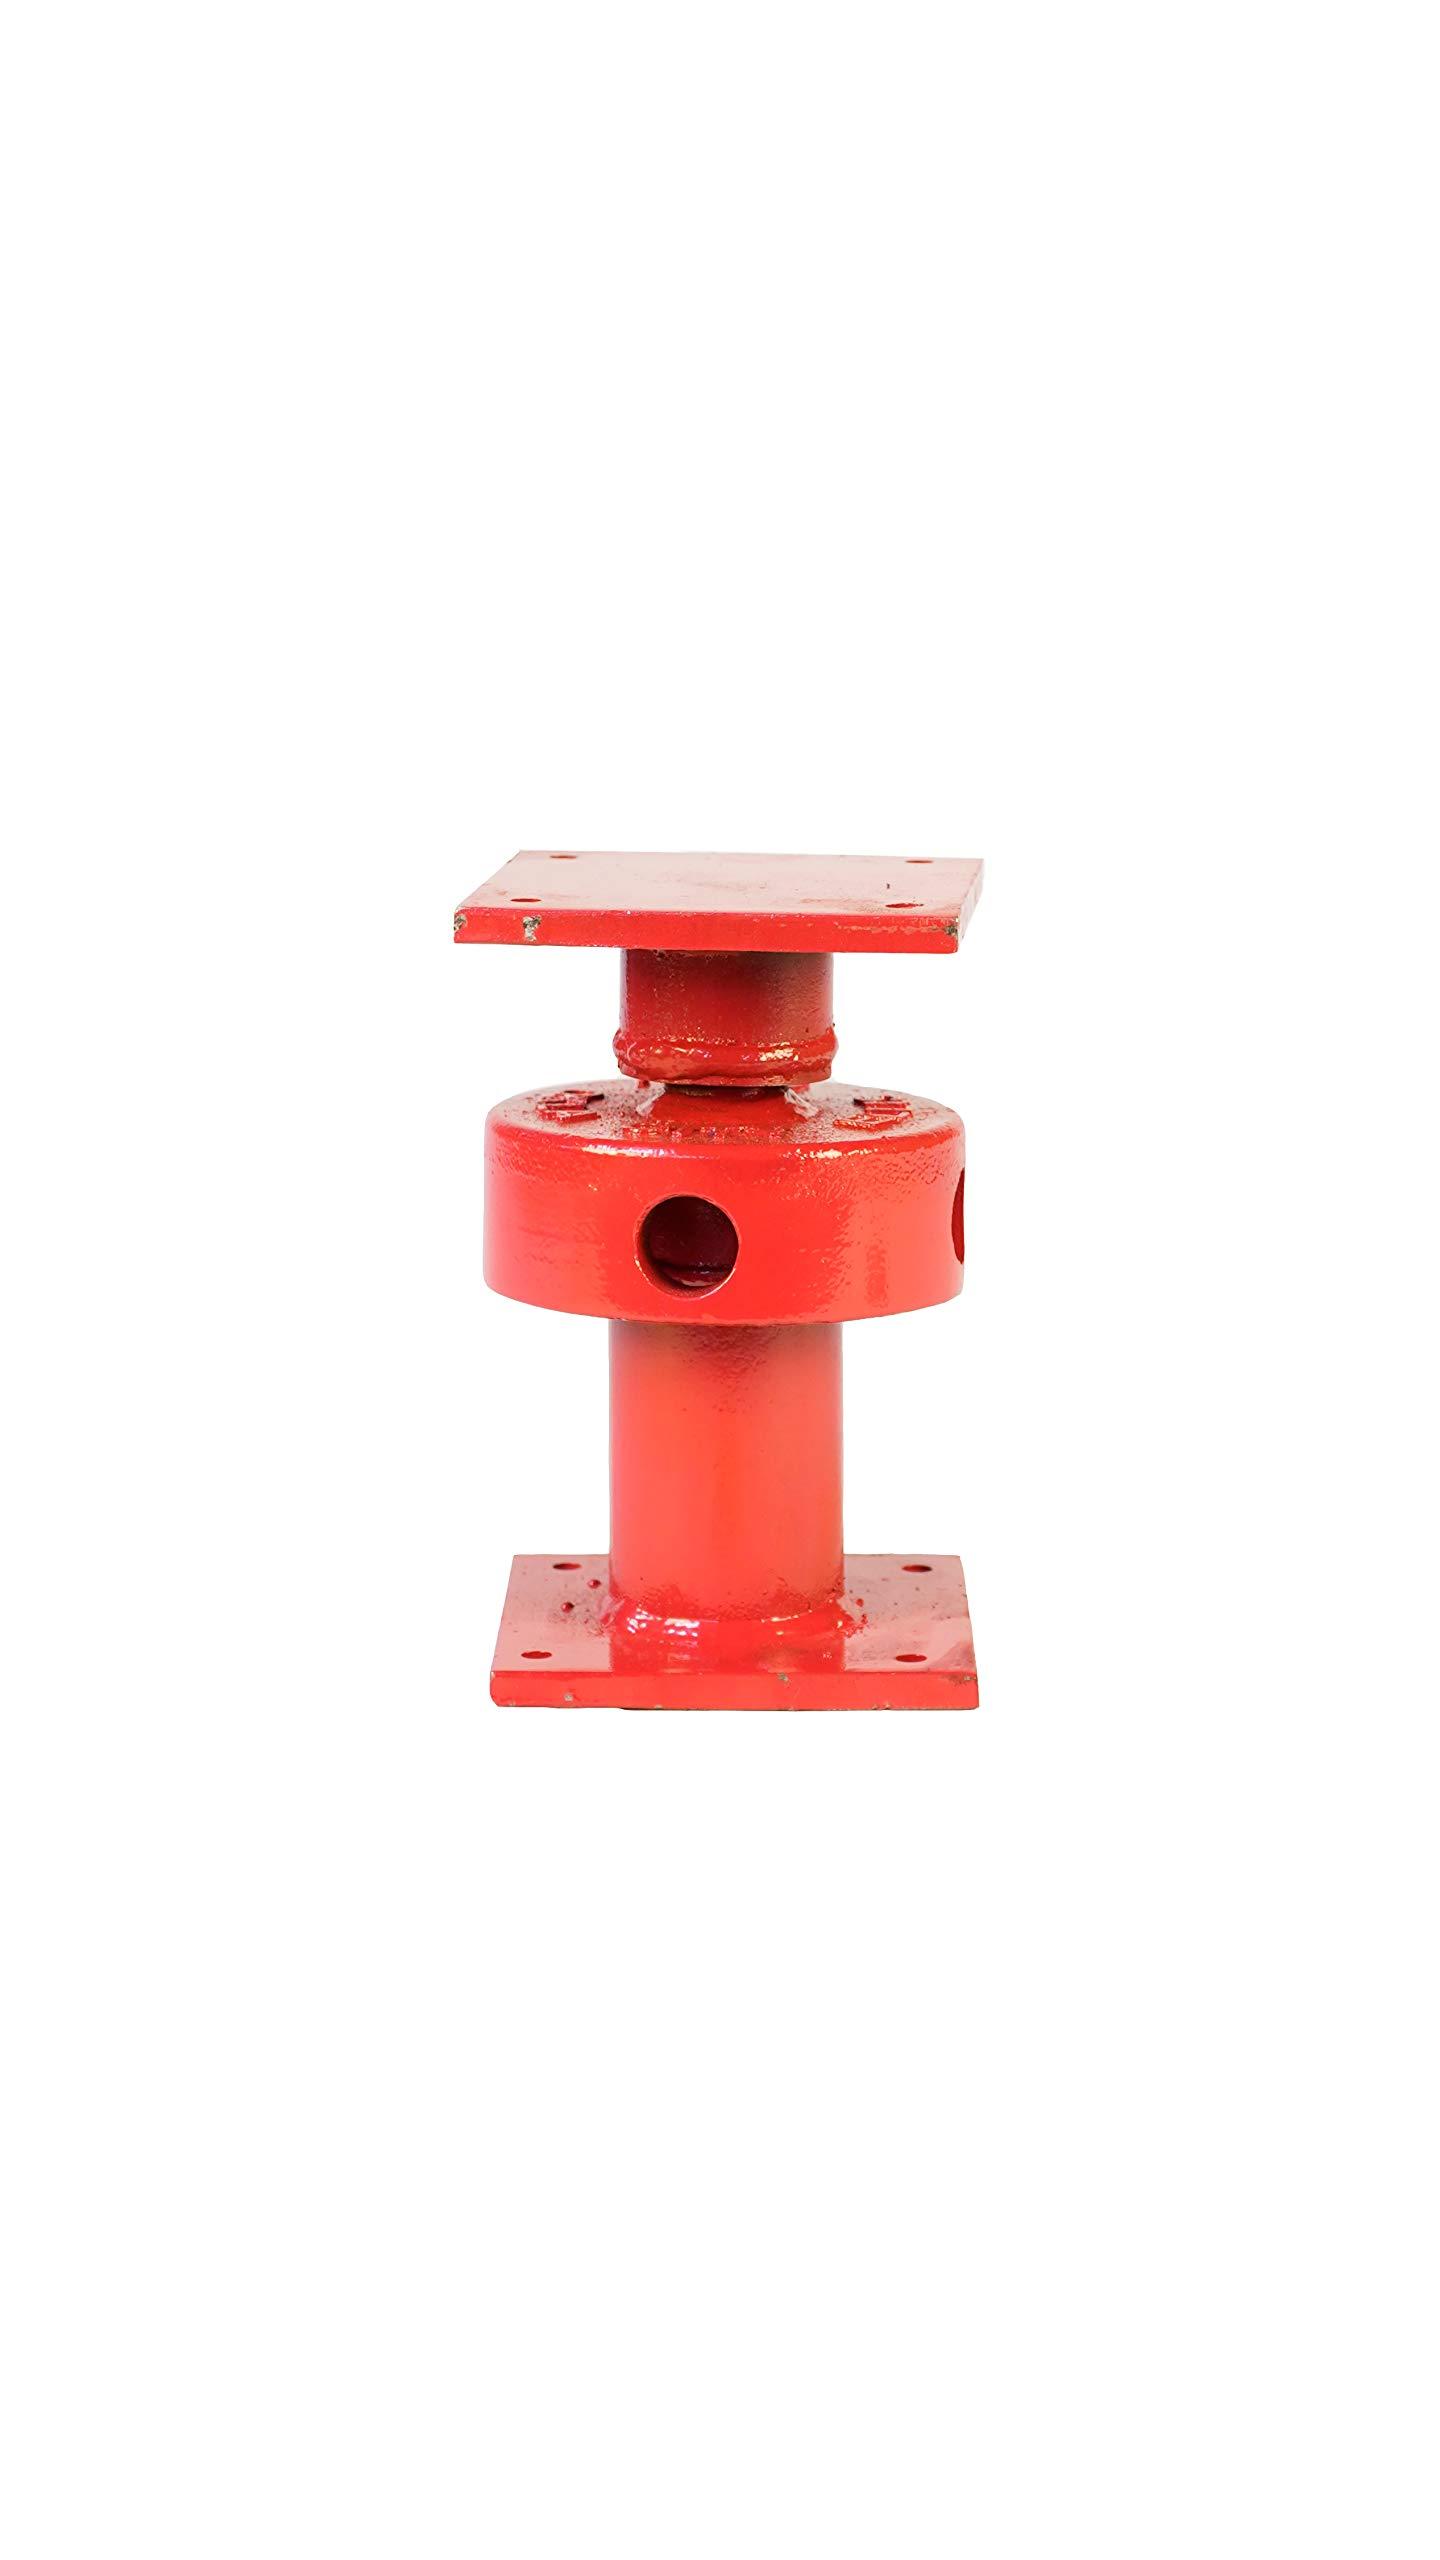 Ellis Manufacturing Company Mini Screw Jack - Adjustable Support Jack - Range of Adjustment 2.5'' - Safe Load Capacity (15,000 lbs) by ELLIS